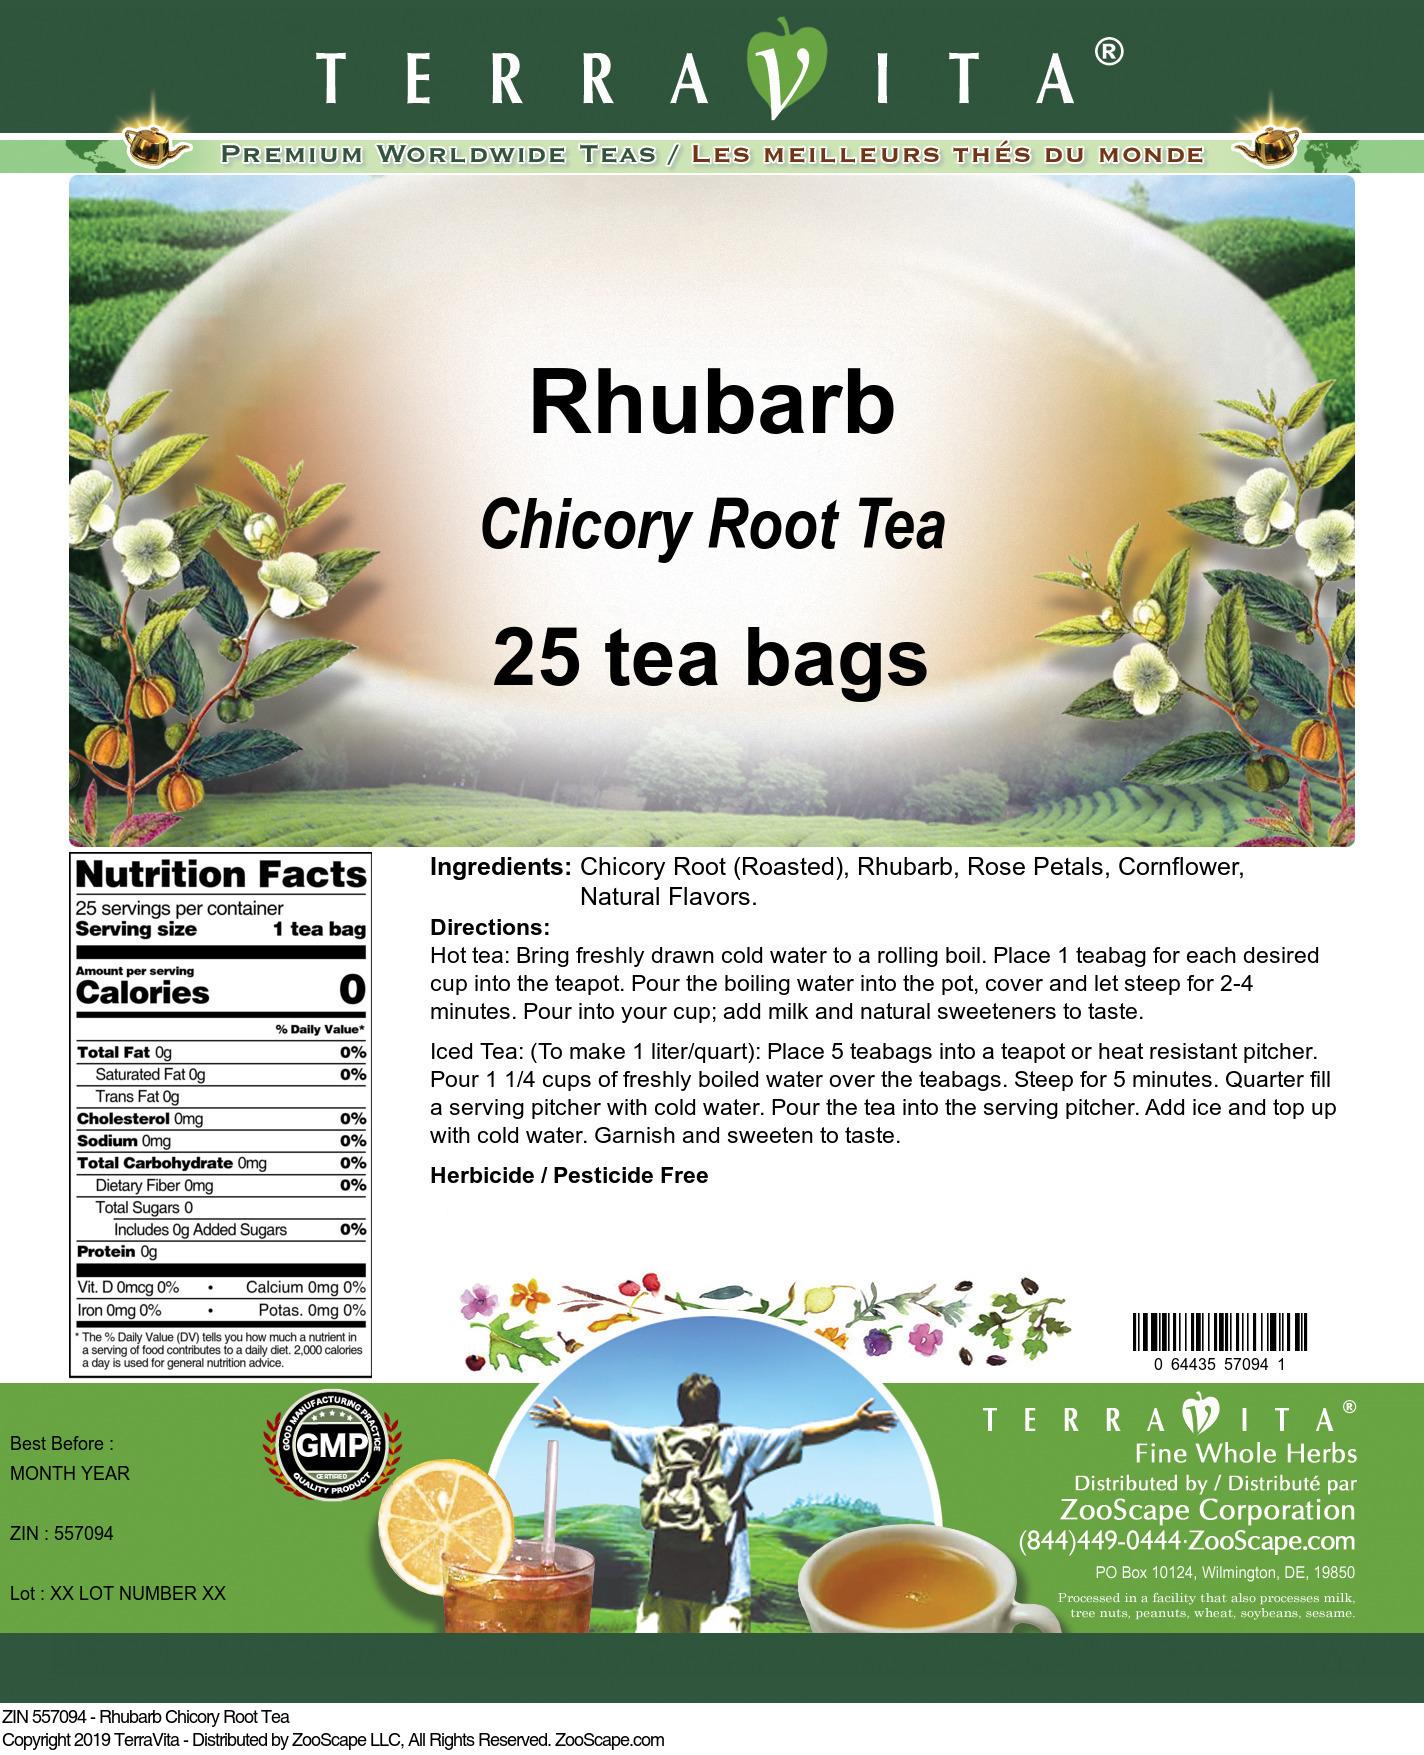 Rhubarb Chicory Root Tea